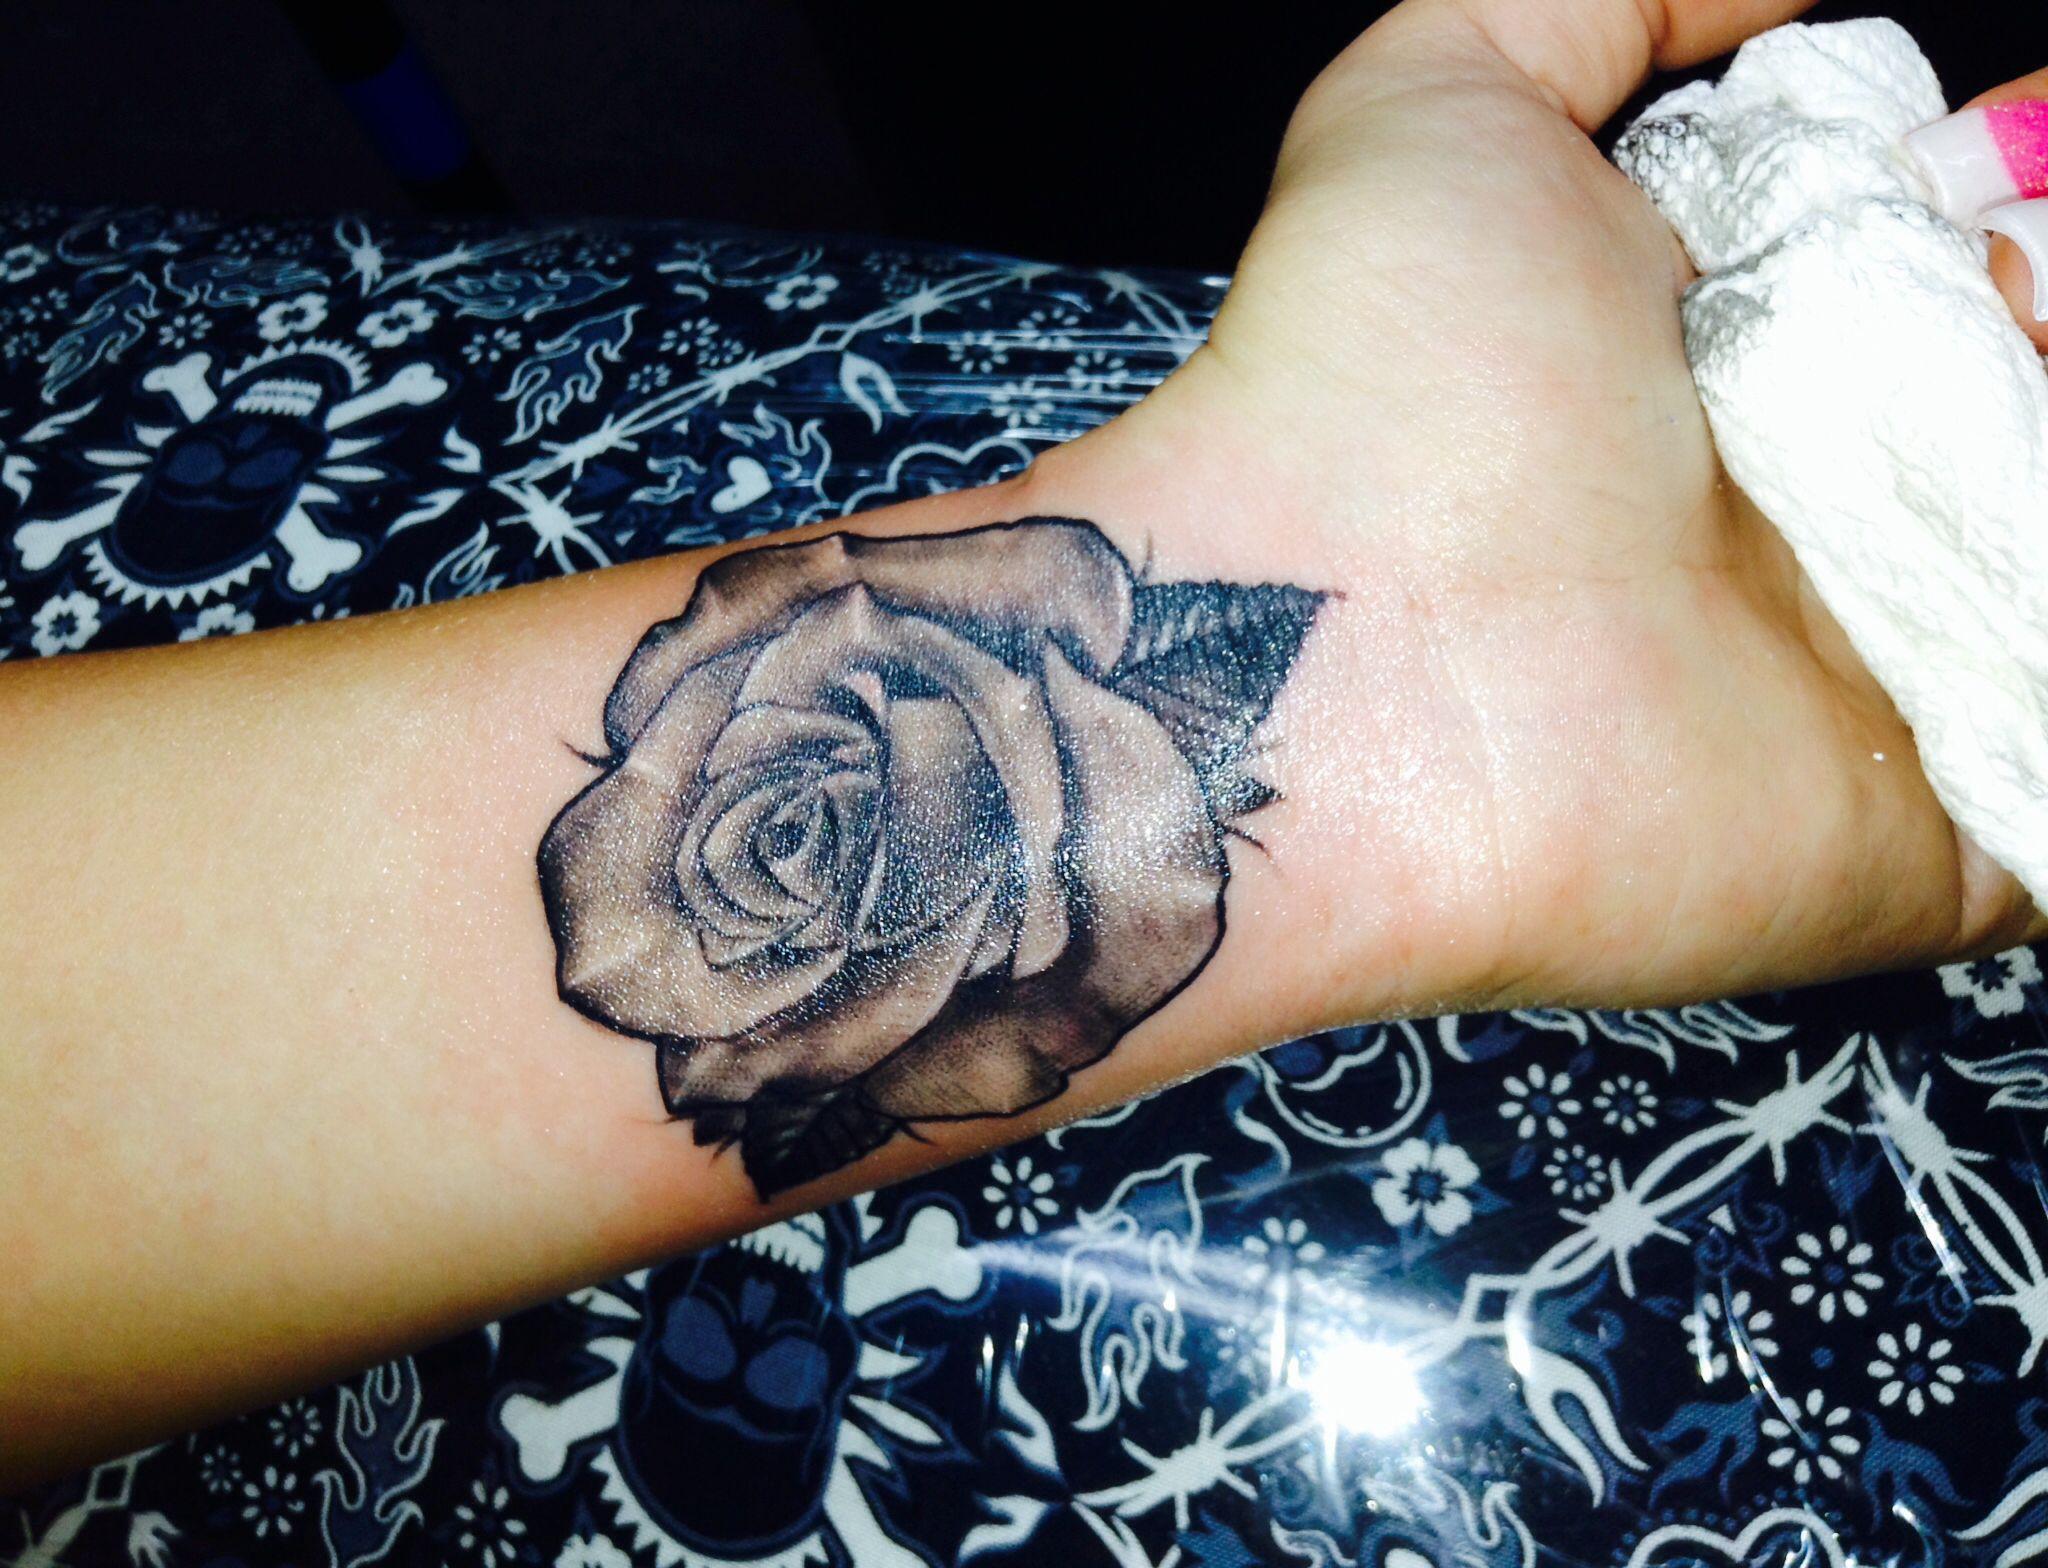 REALISTIC ROSE TATTOO on wrist/inner arm | Tattoos ...